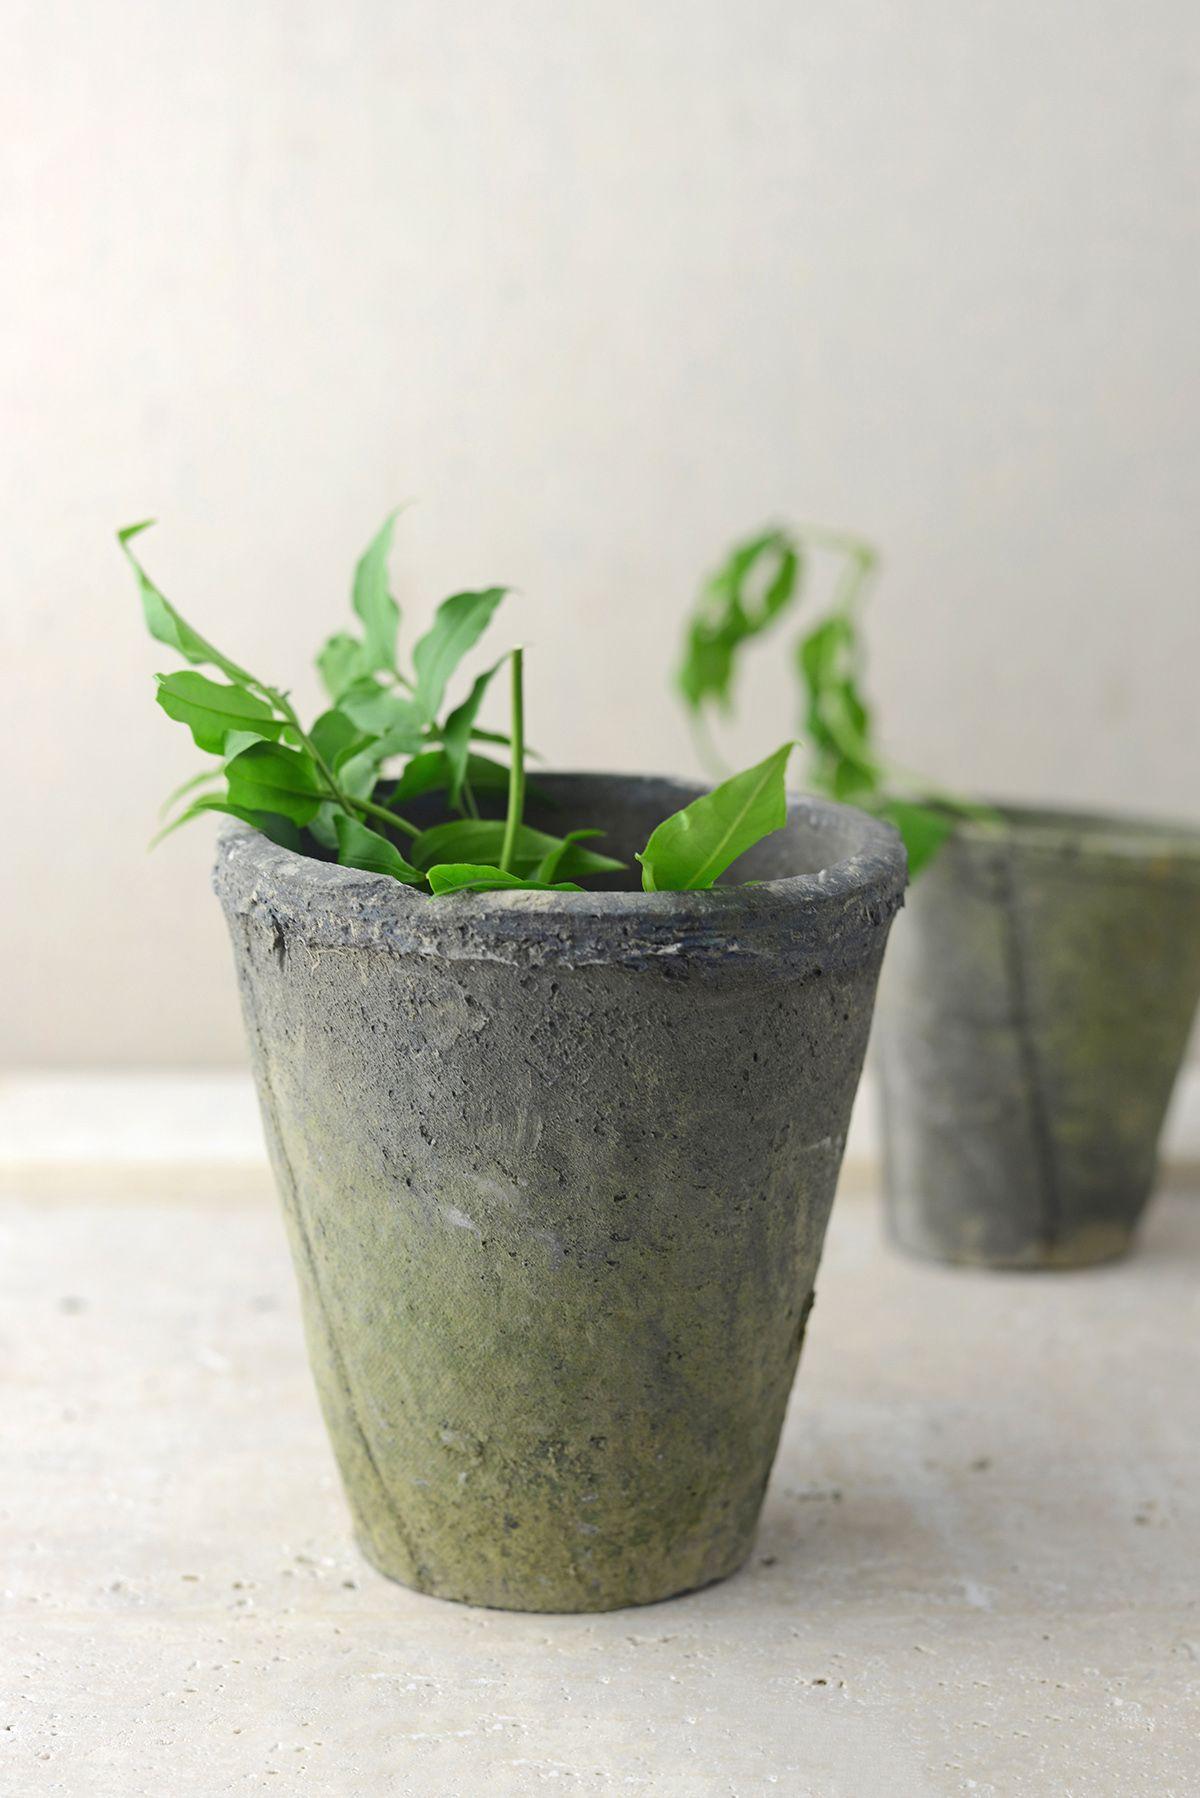 Homespun Cement Pot 5 3 4 Inch Cement Pots Flower Pots Cement Flower Pots